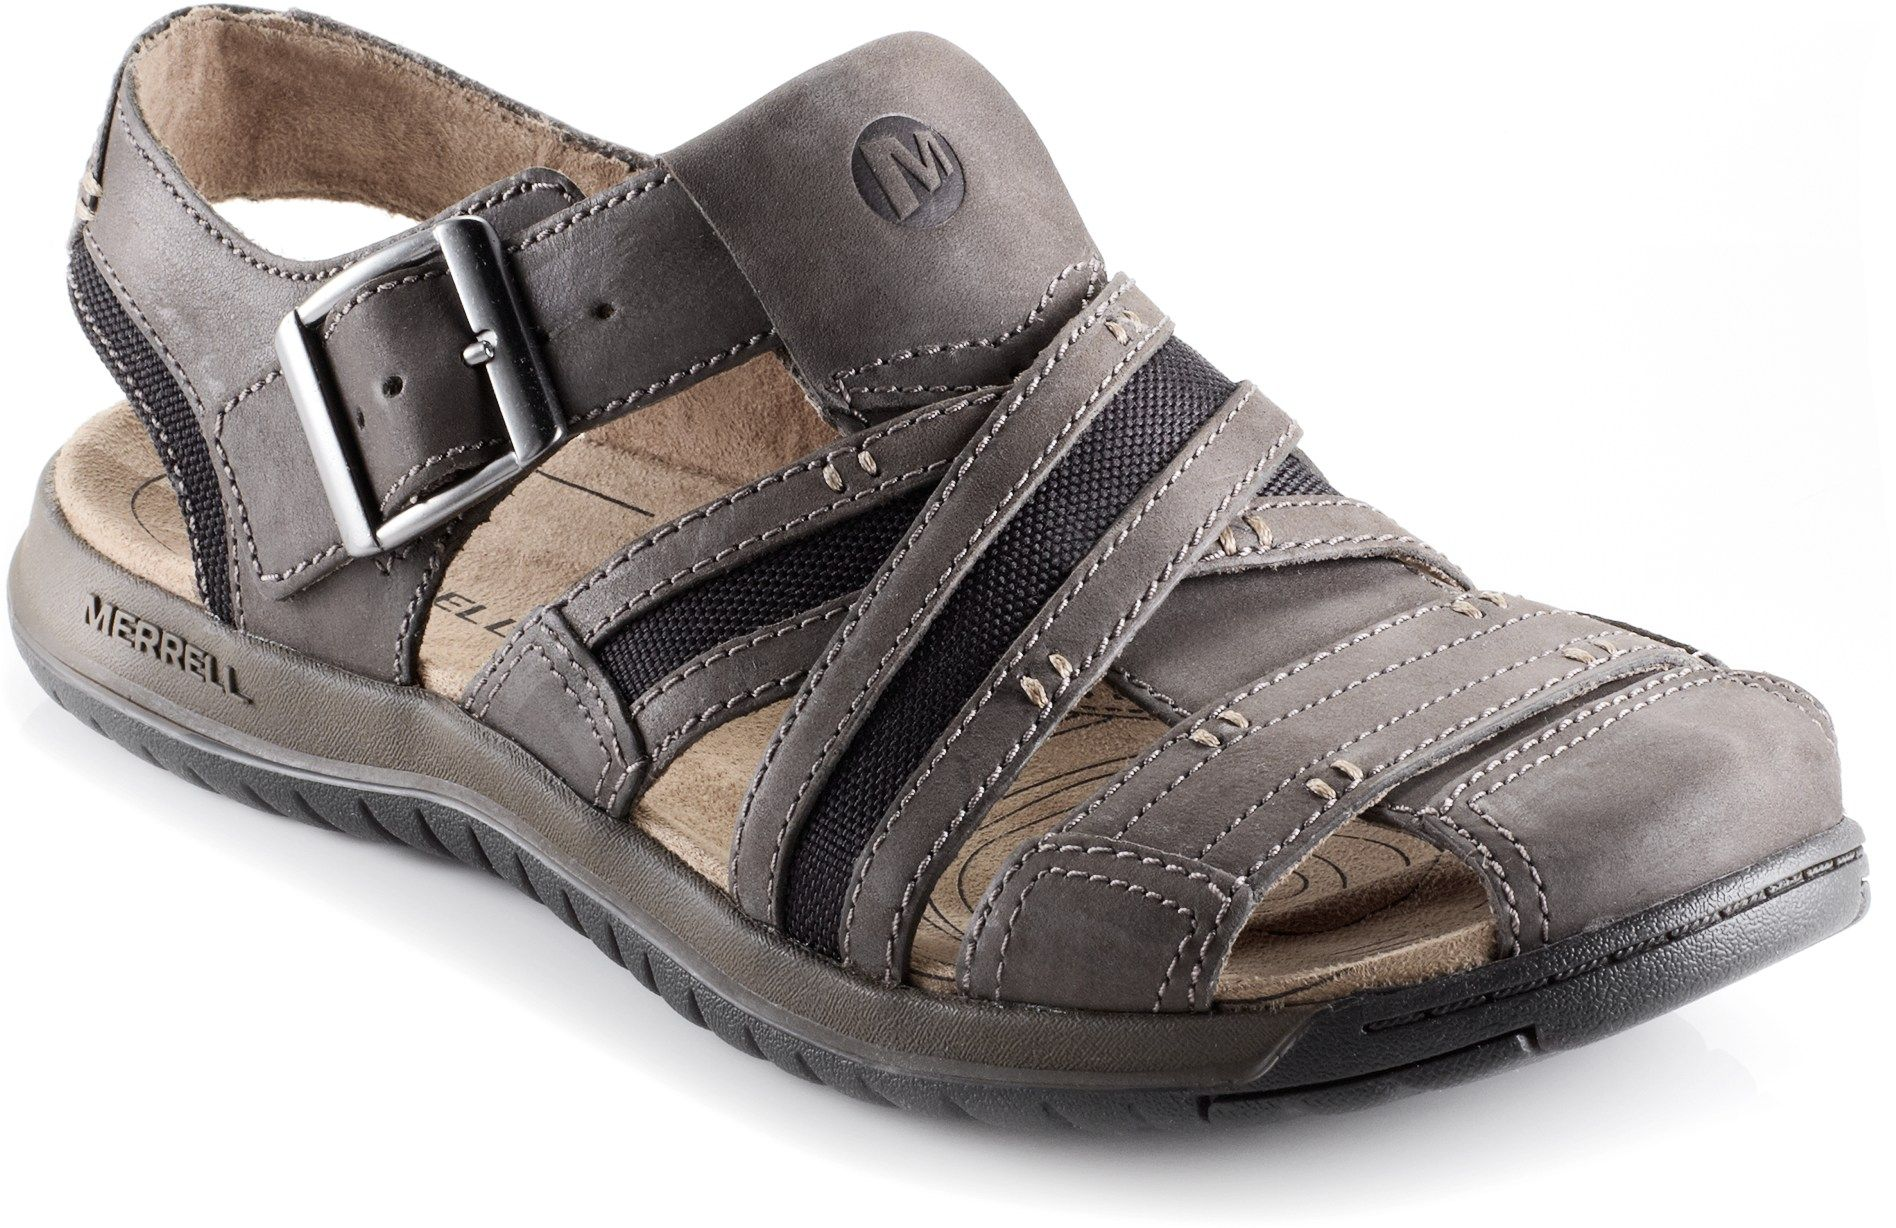 Mens sandals, Gents slippers